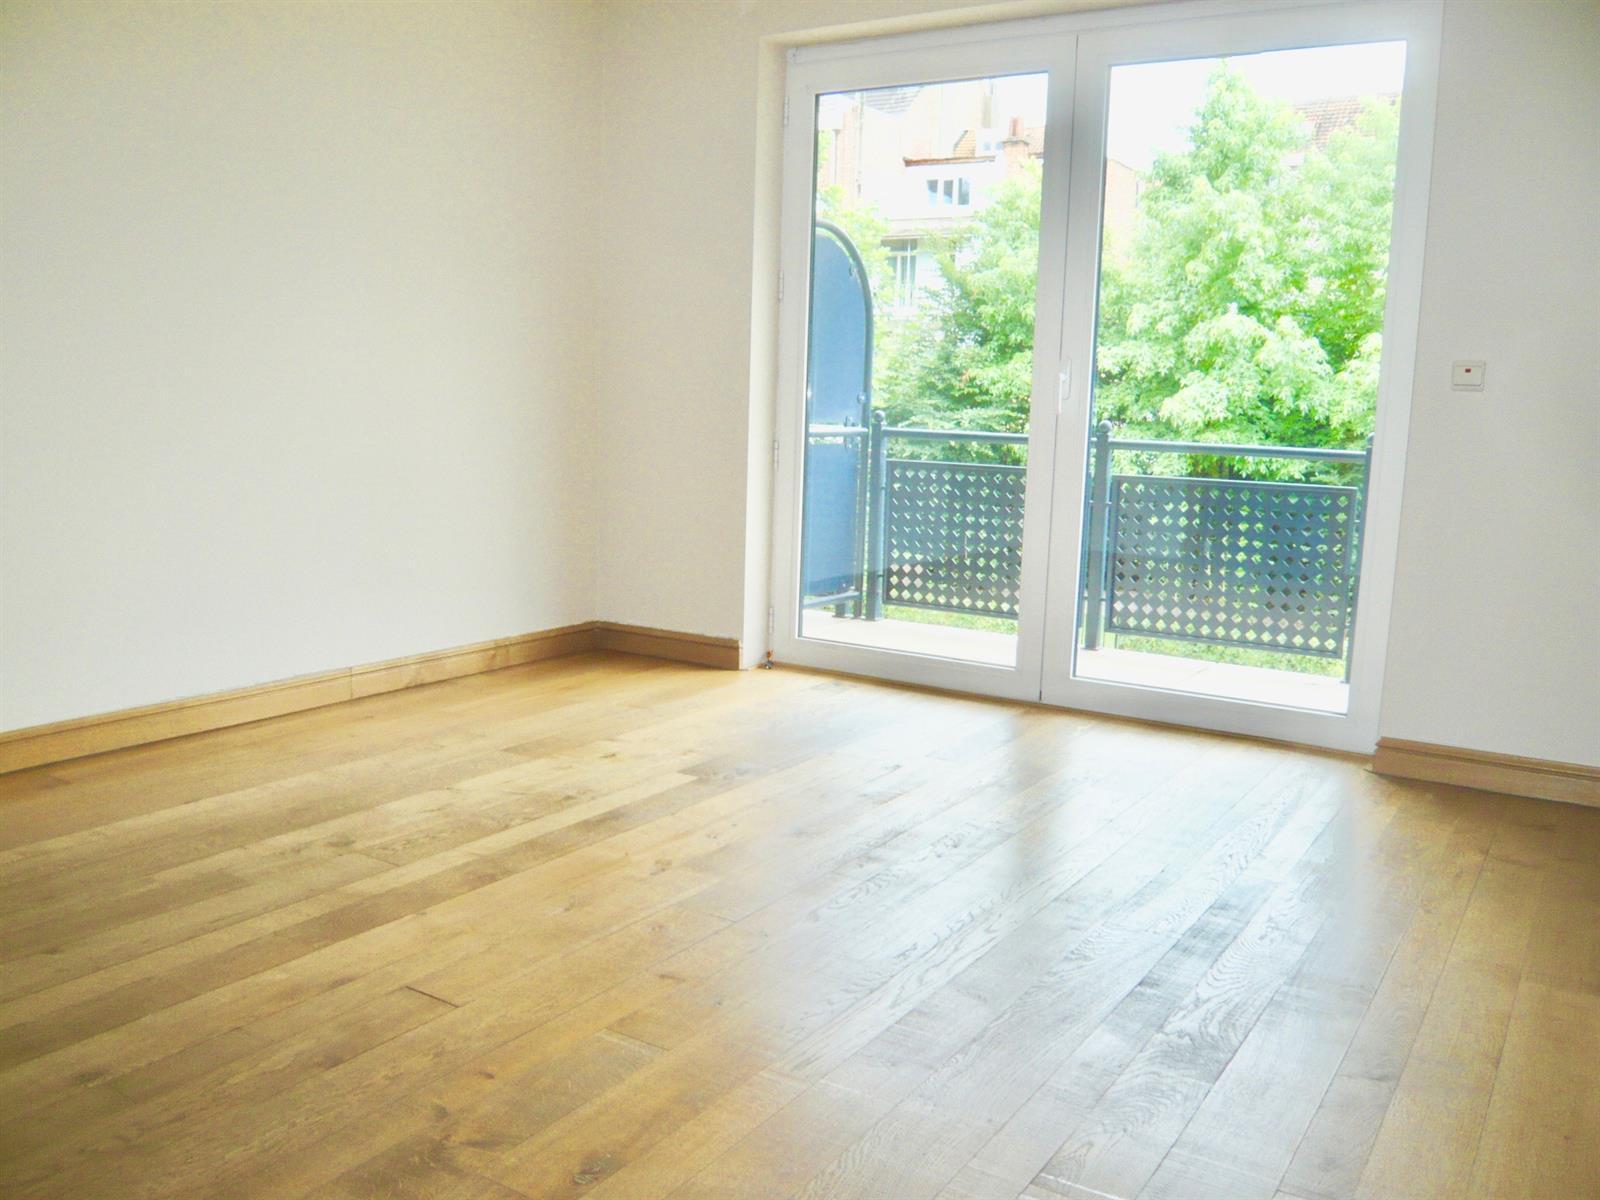 Appartement exceptionnel - Woluwe-Saint-Pierre - #4433517-26